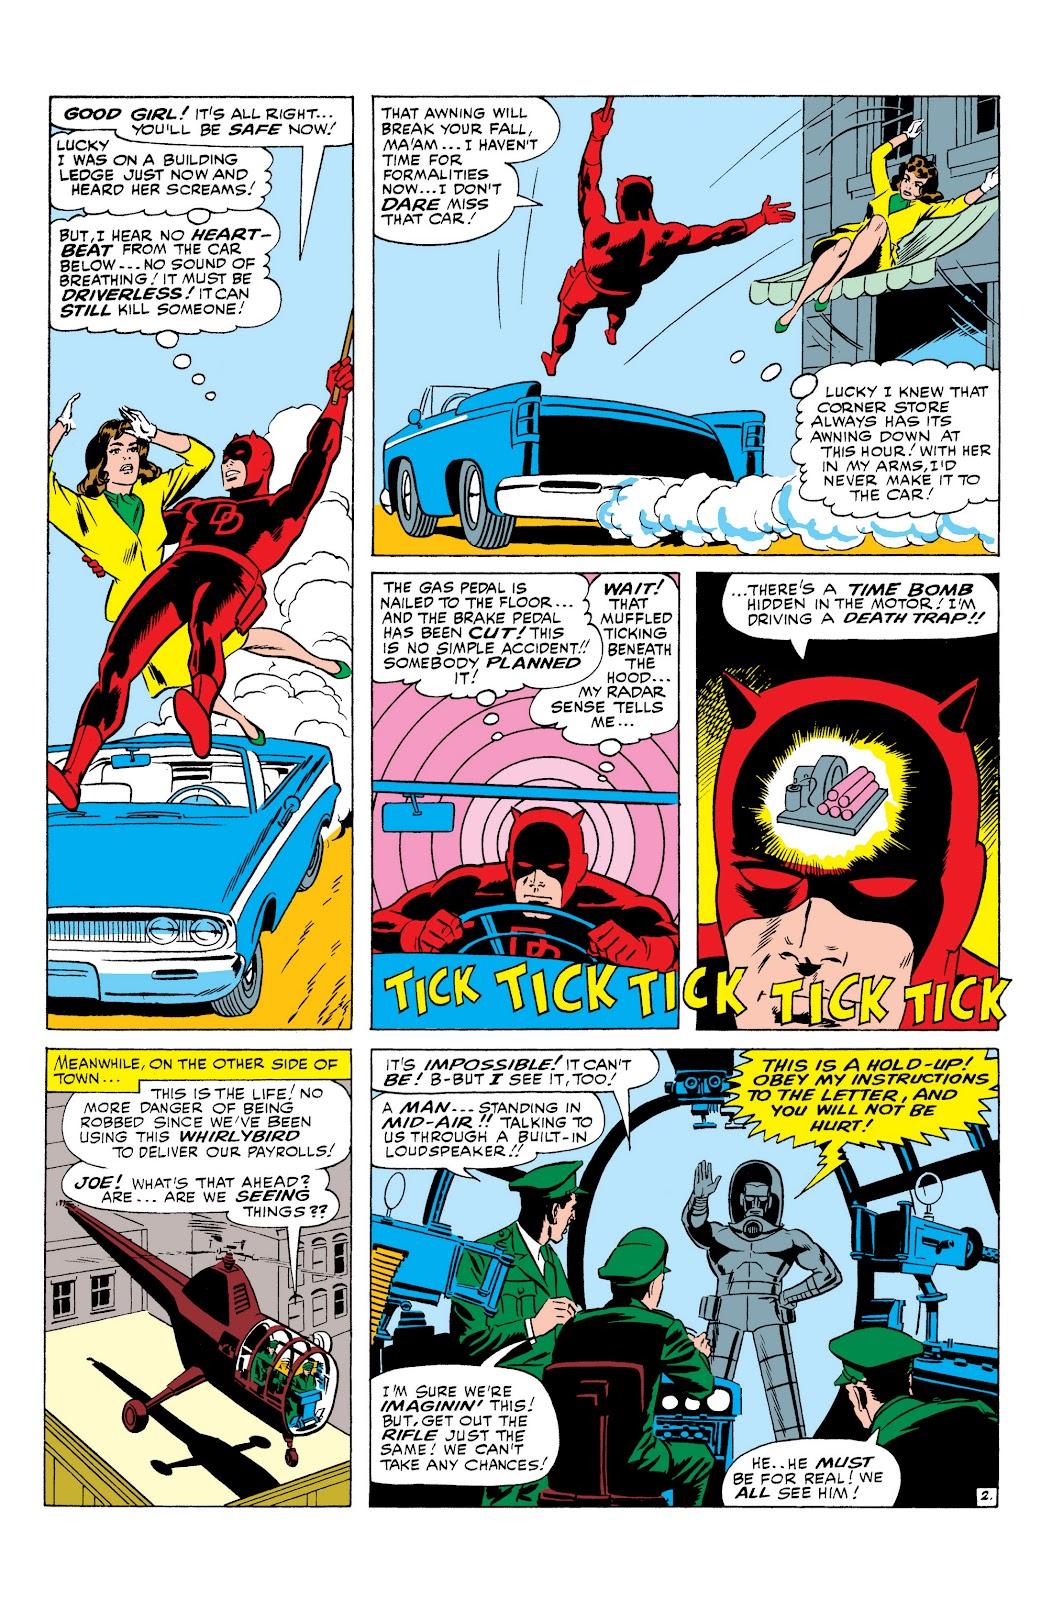 Read online Marvel Masterworks: Daredevil comic - Issue # TPB 1 (Part 2) - 66